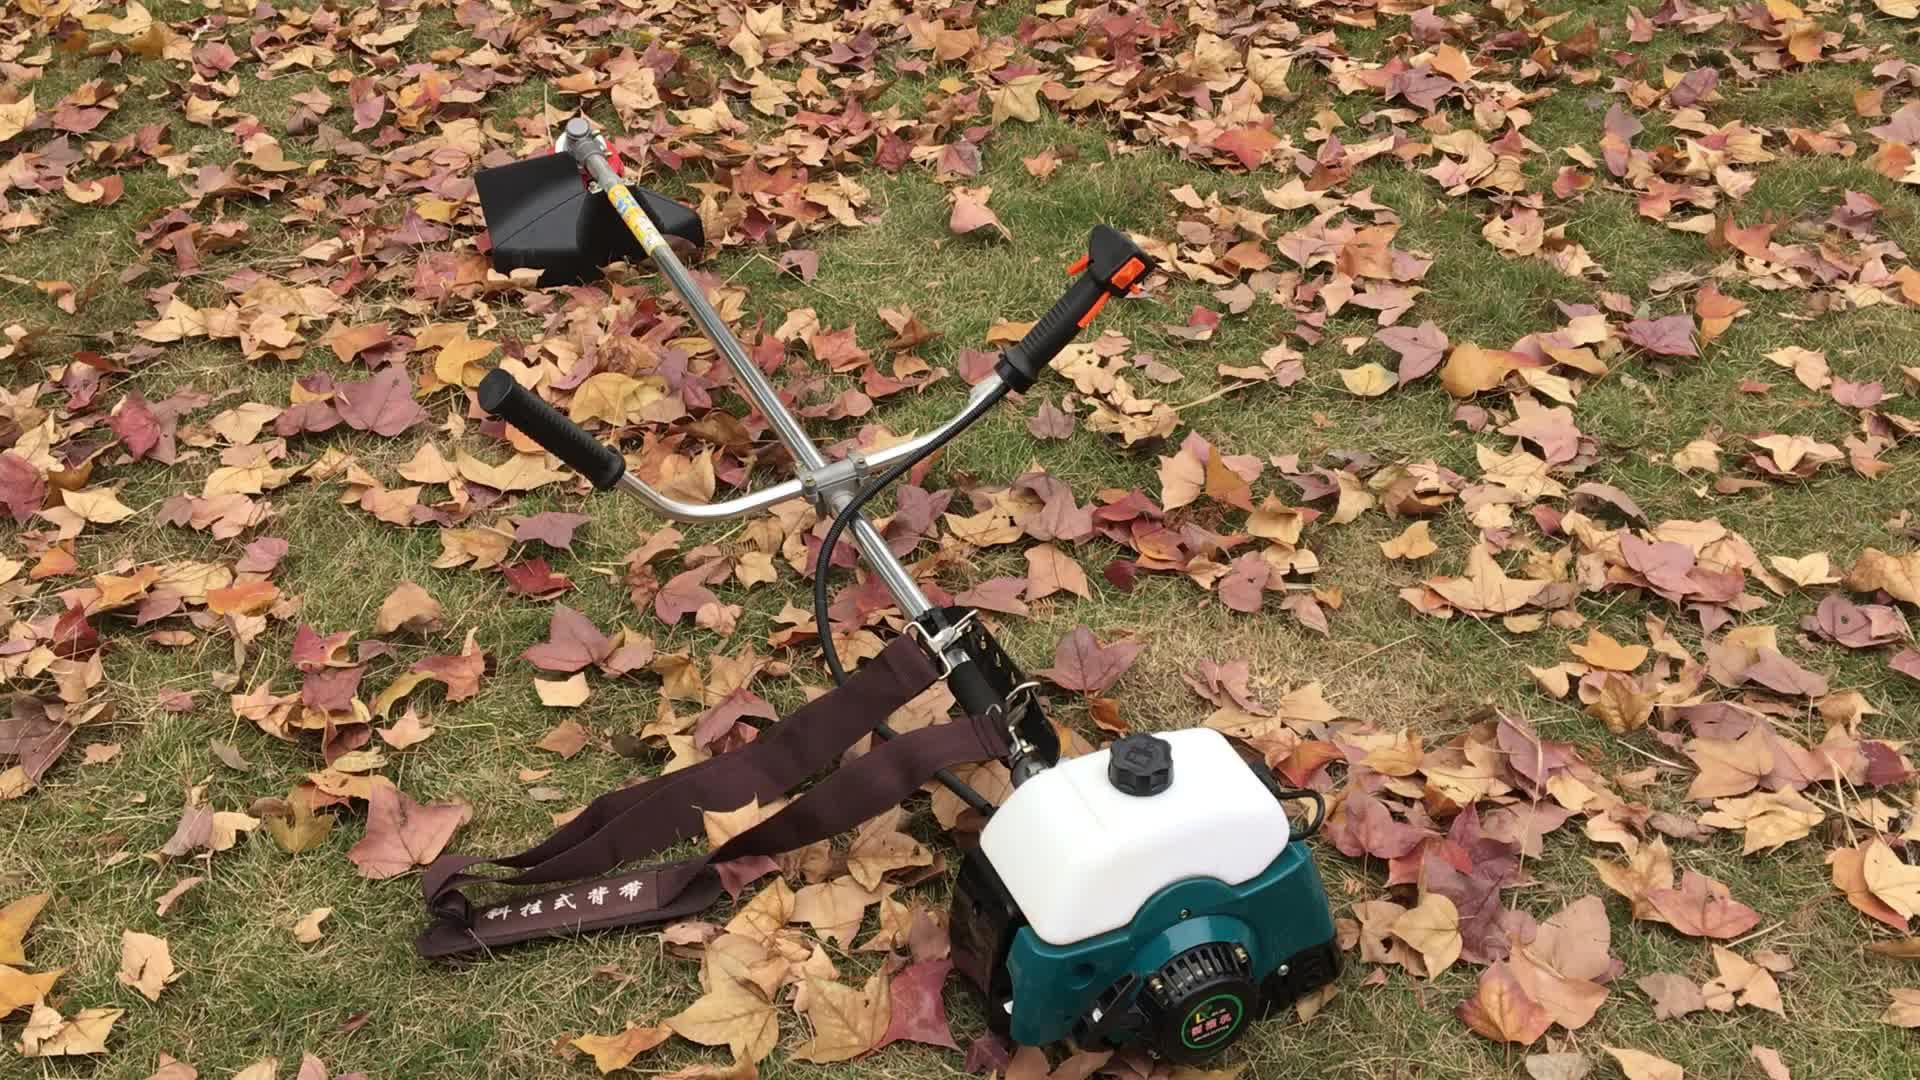 Thailand cg411 robin makita trimmer line grass brush cutter